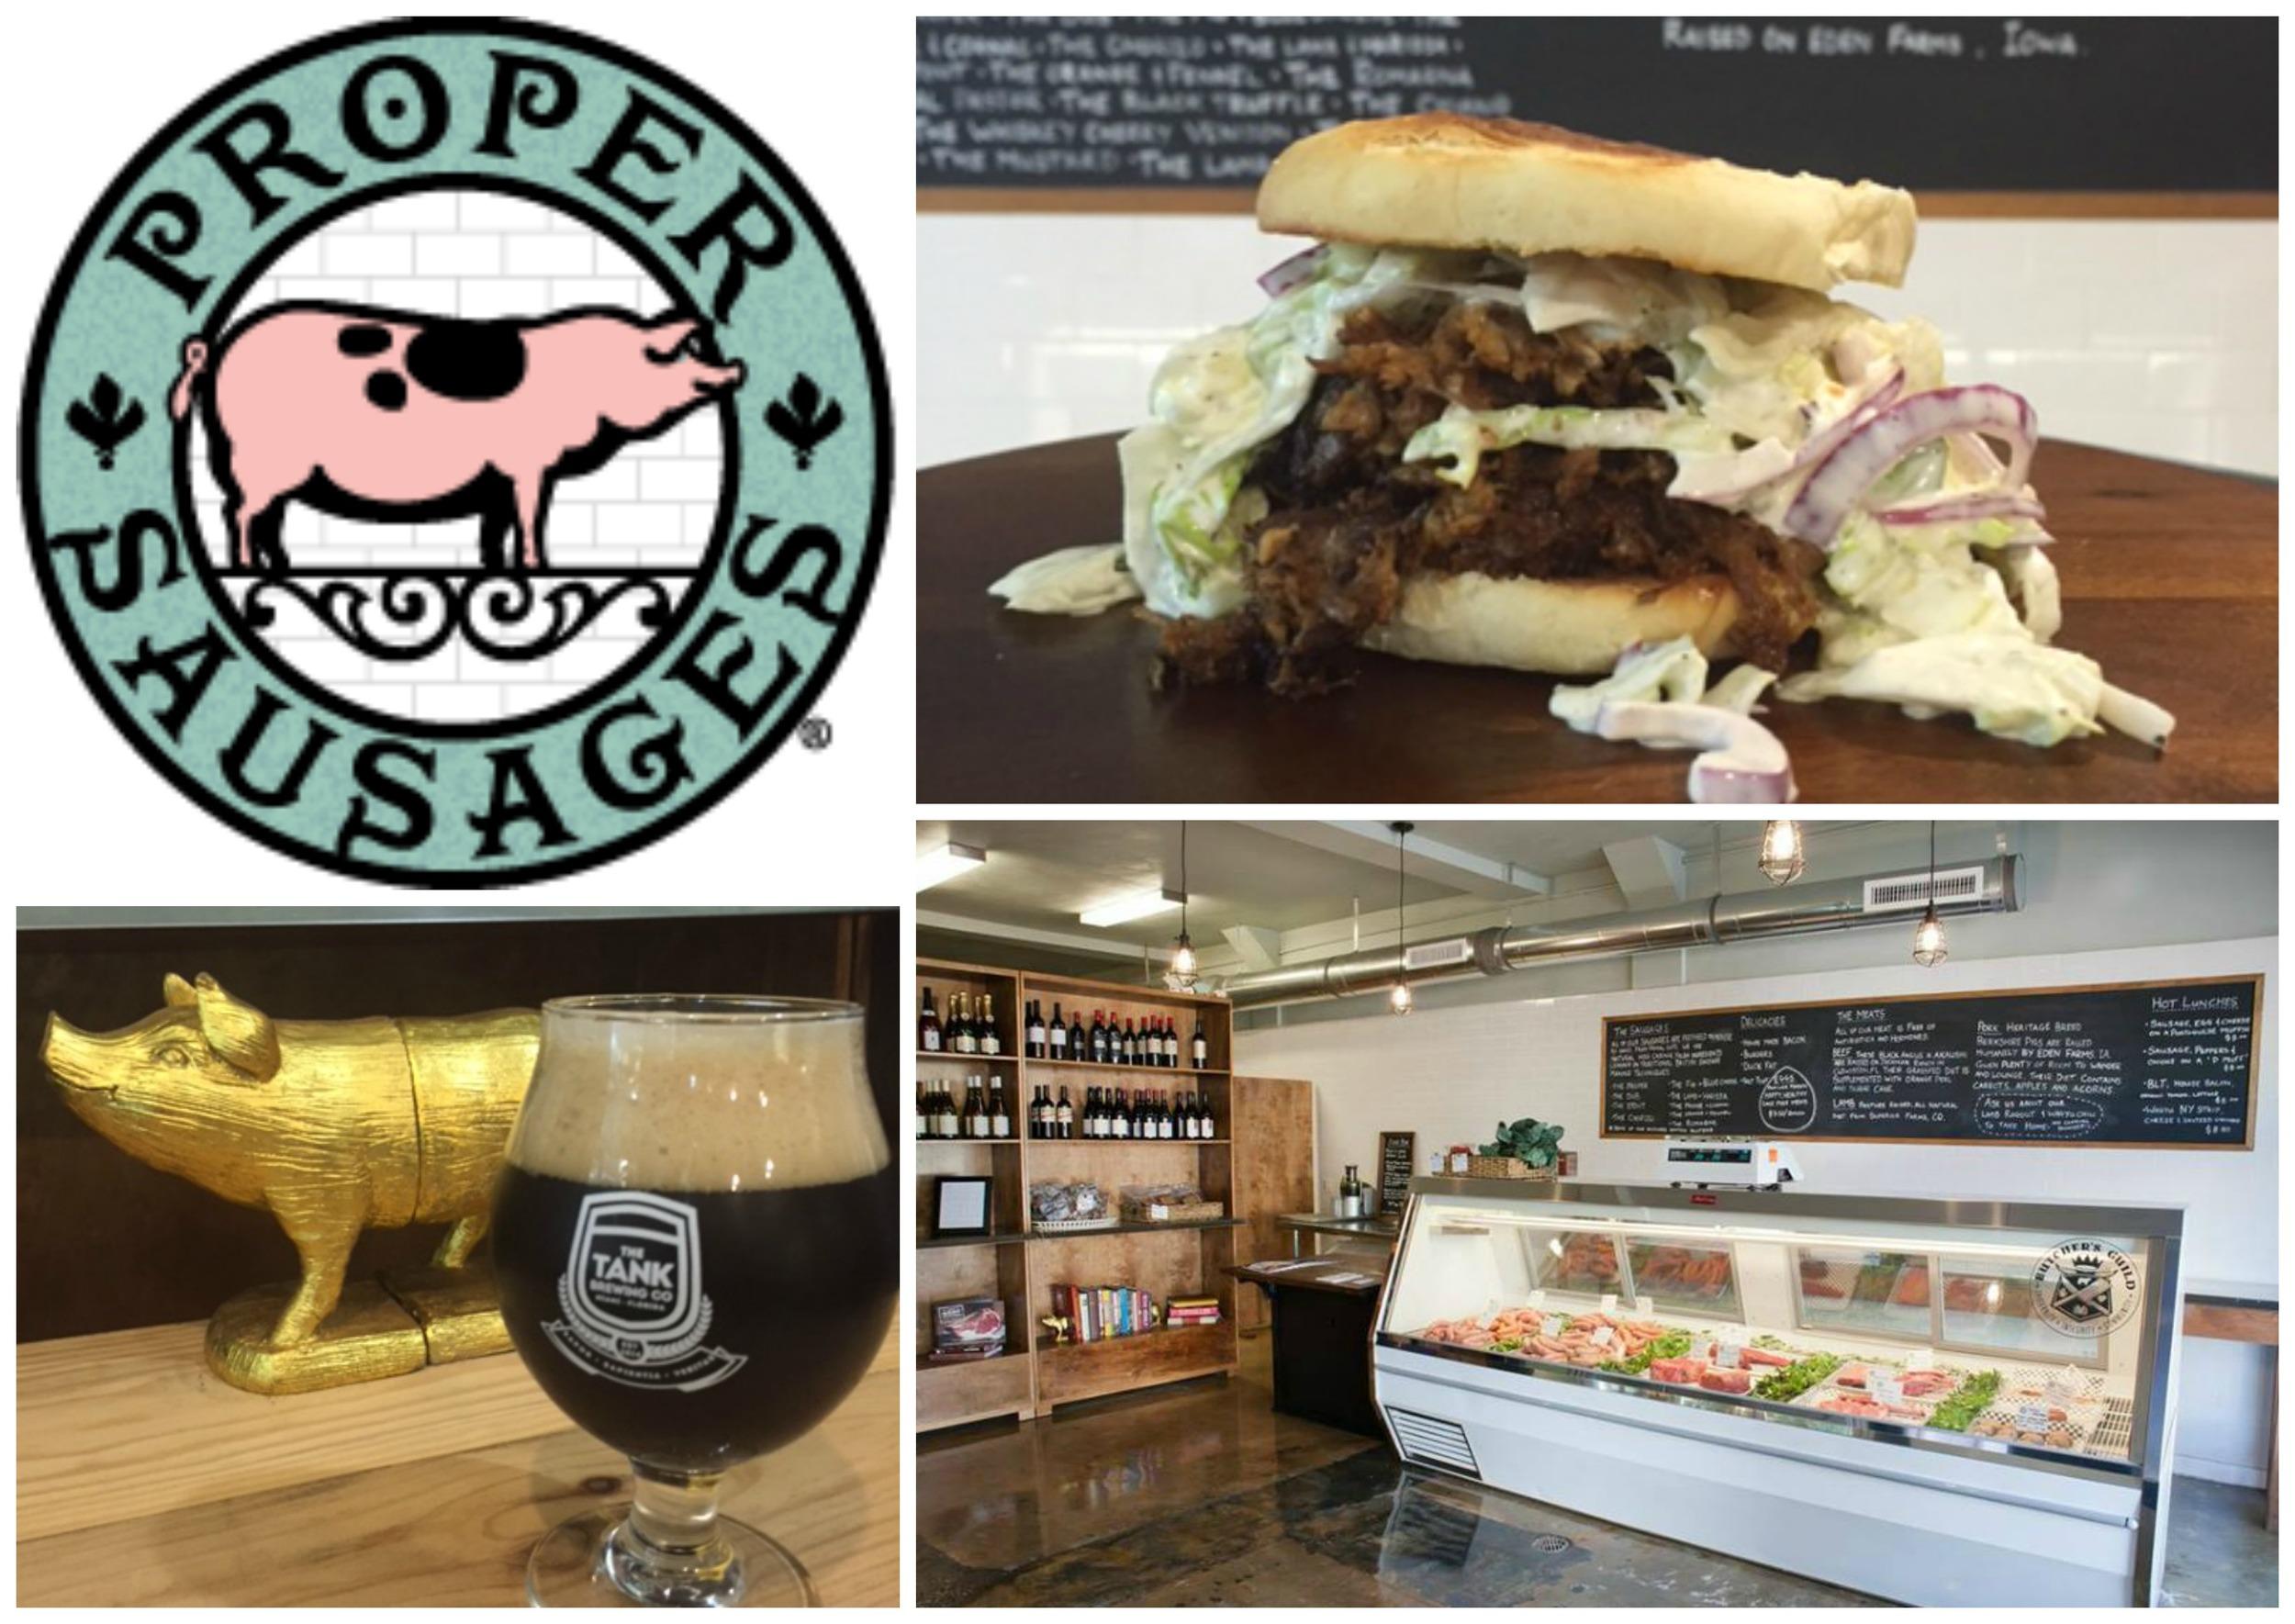 Proper Sausages Butcher and Sandwiches Miami Florida